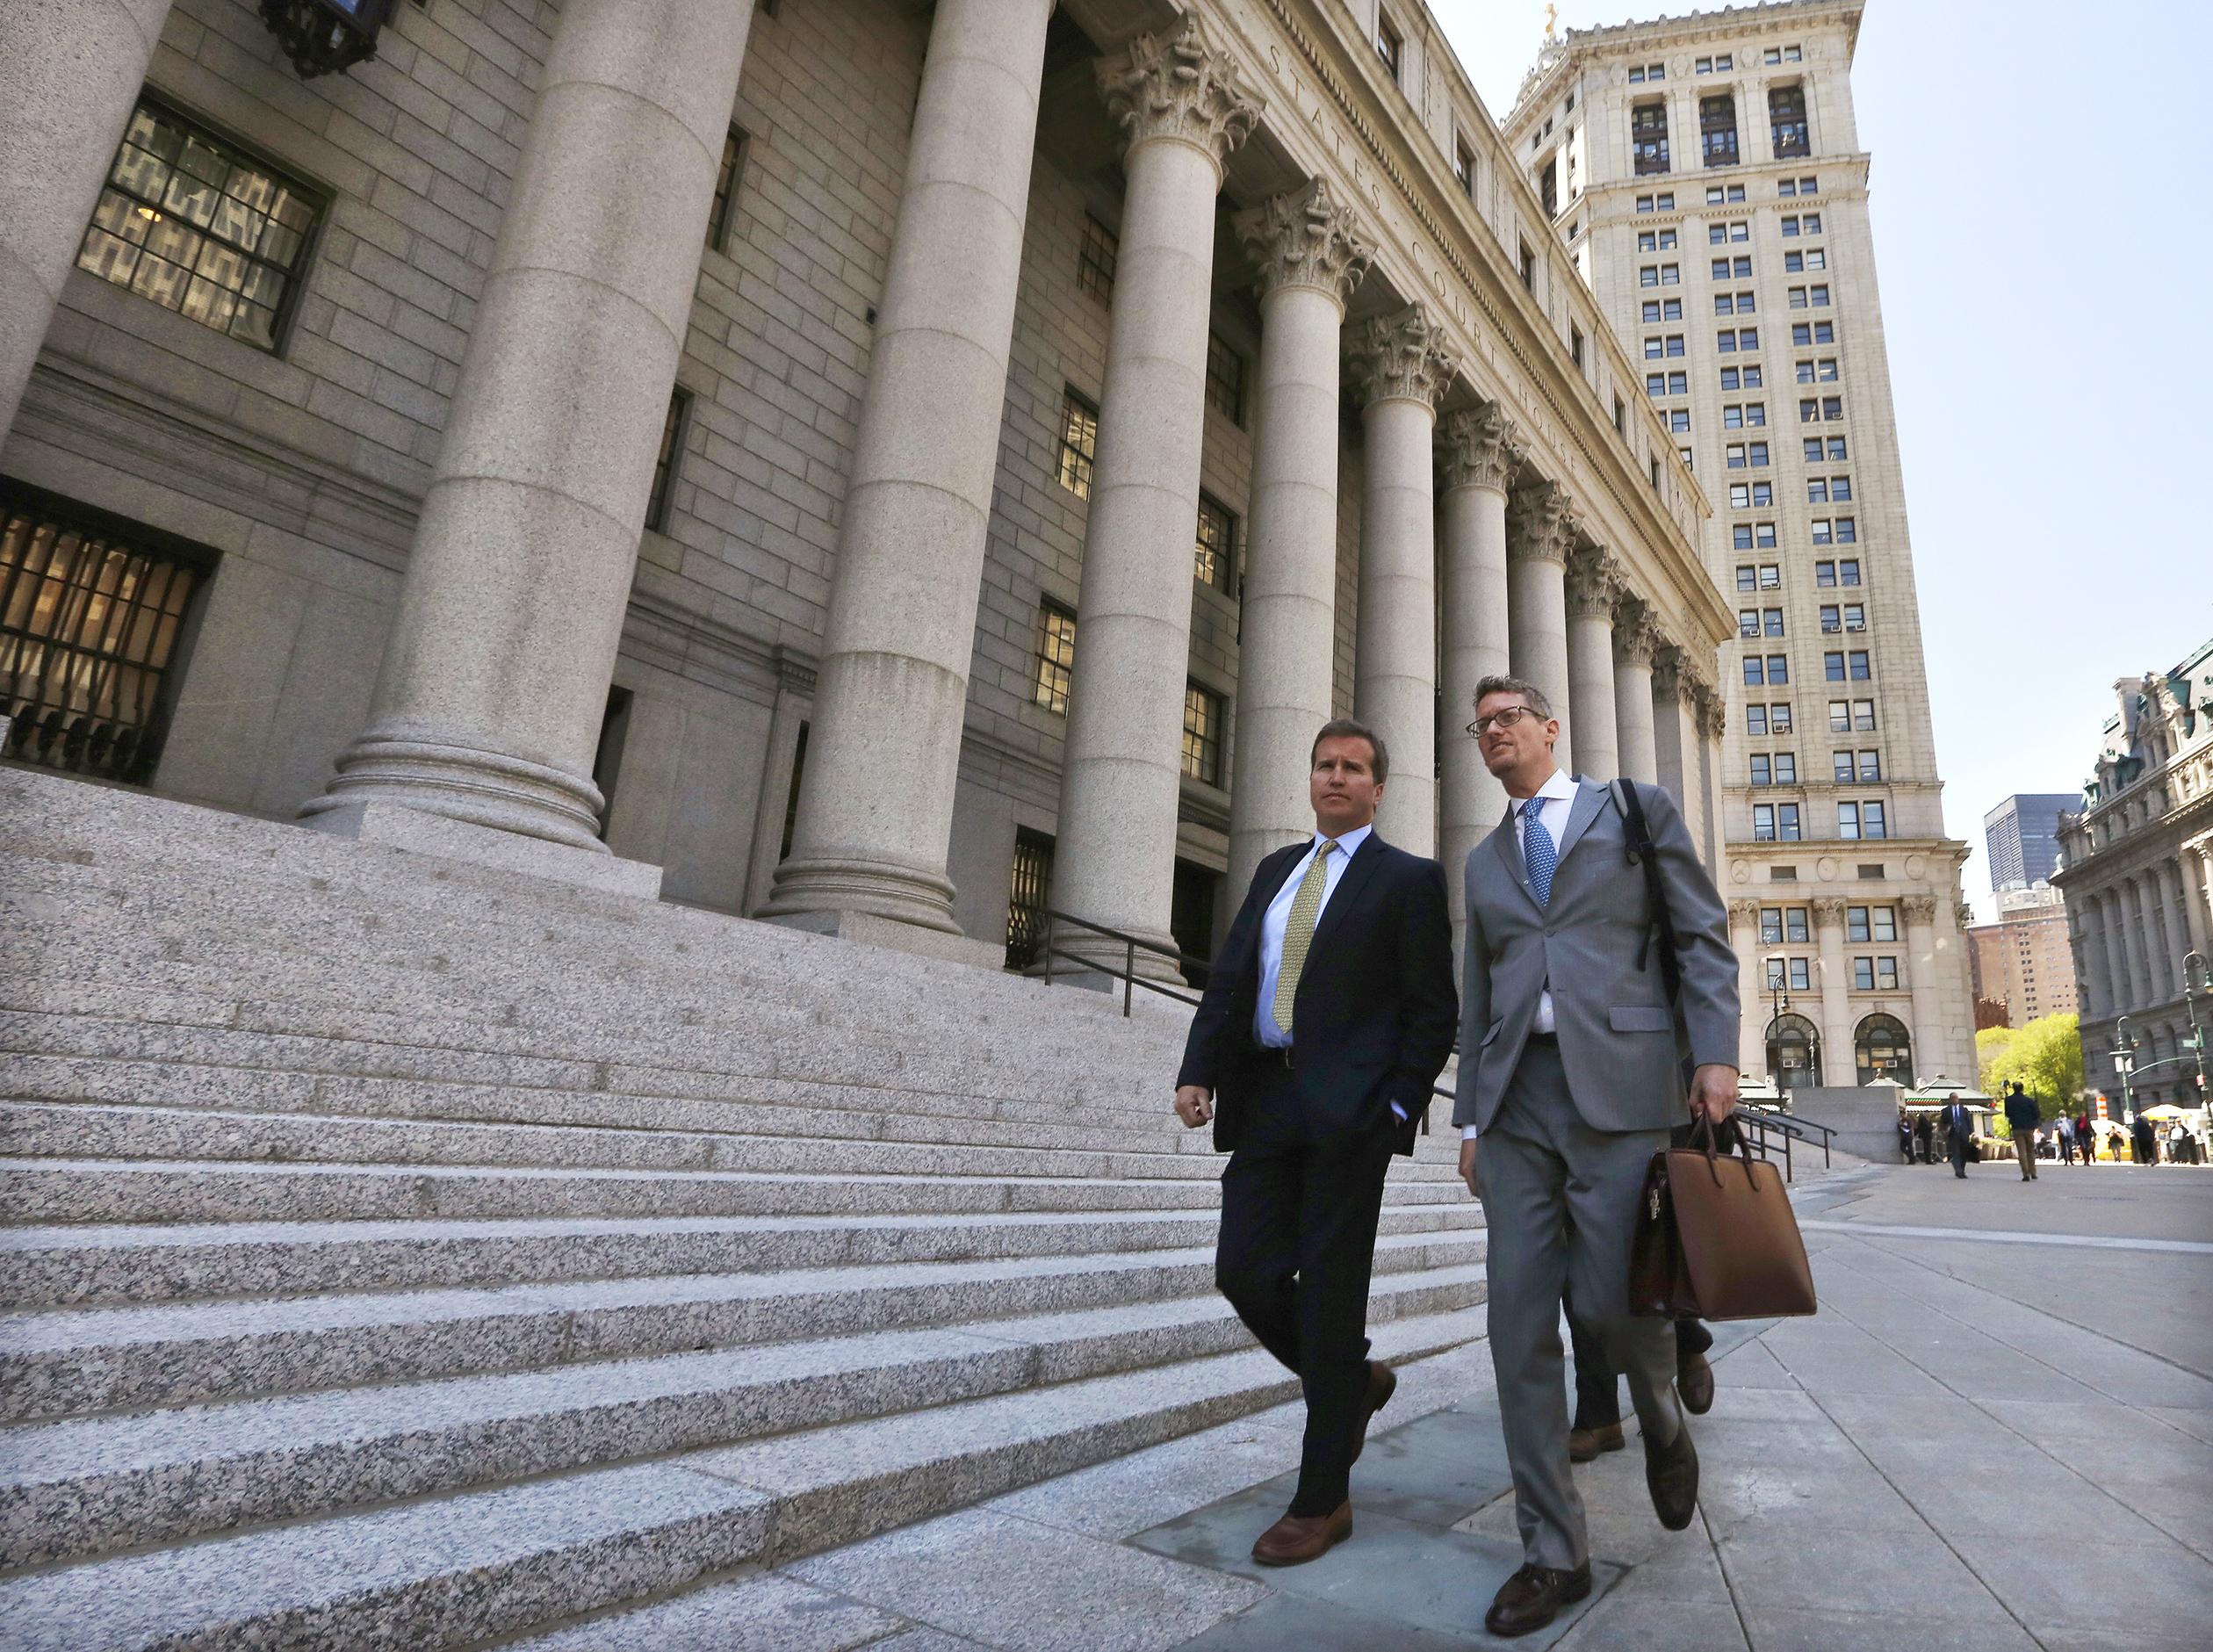 Todd Newman, Diamondback Capital Management portfolio manager, exits the United States Court in Manhattan